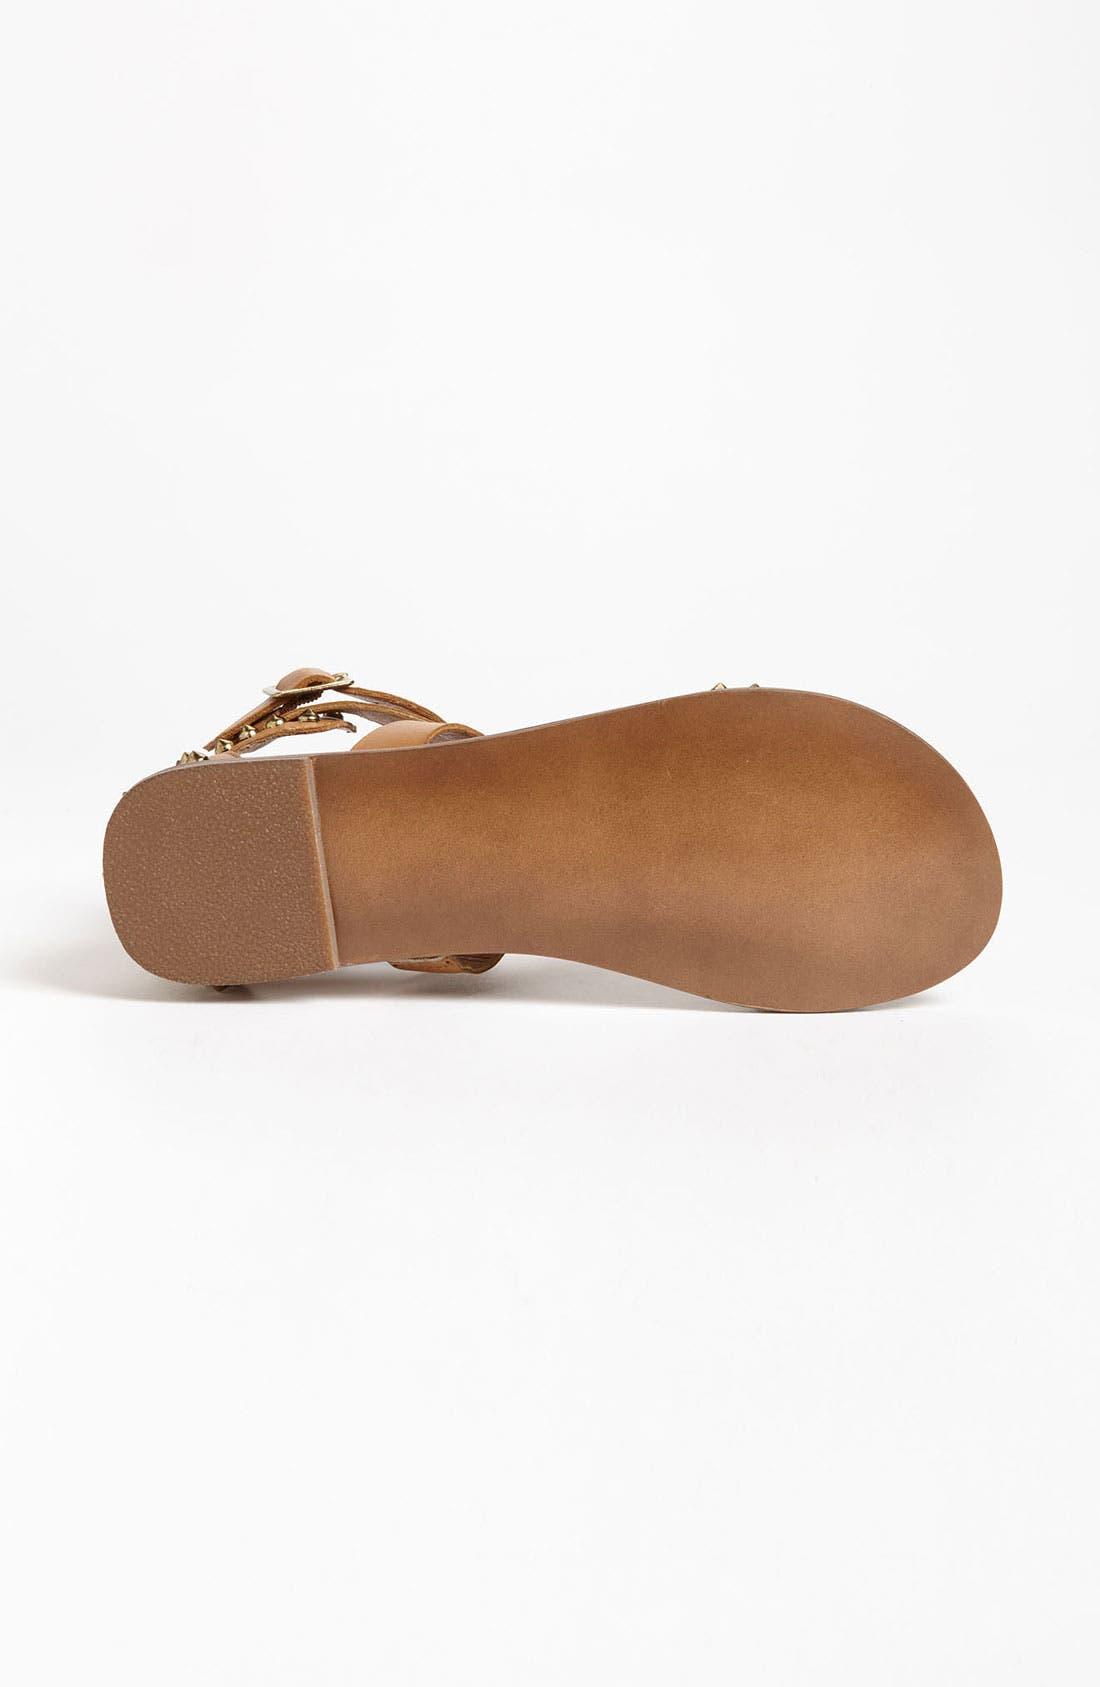 'Buddies' Sandal,                             Alternate thumbnail 6, color,